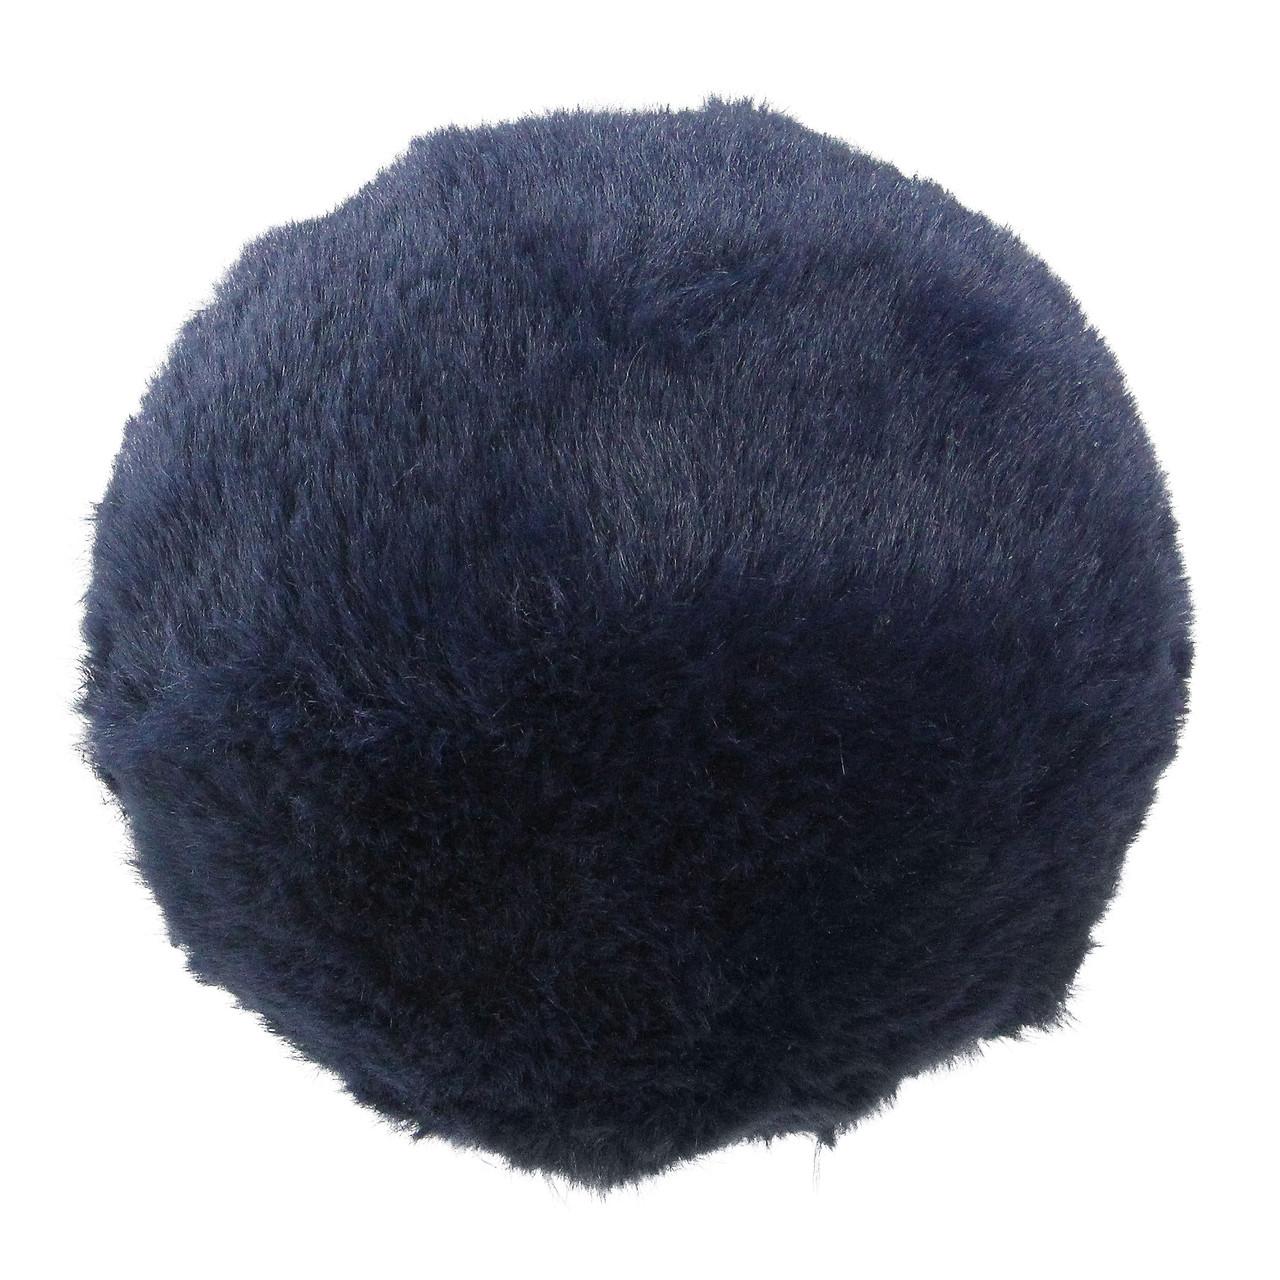 4 5 Navy Blue Faux Fur Ball Christmas Ornament Decoration 32627488